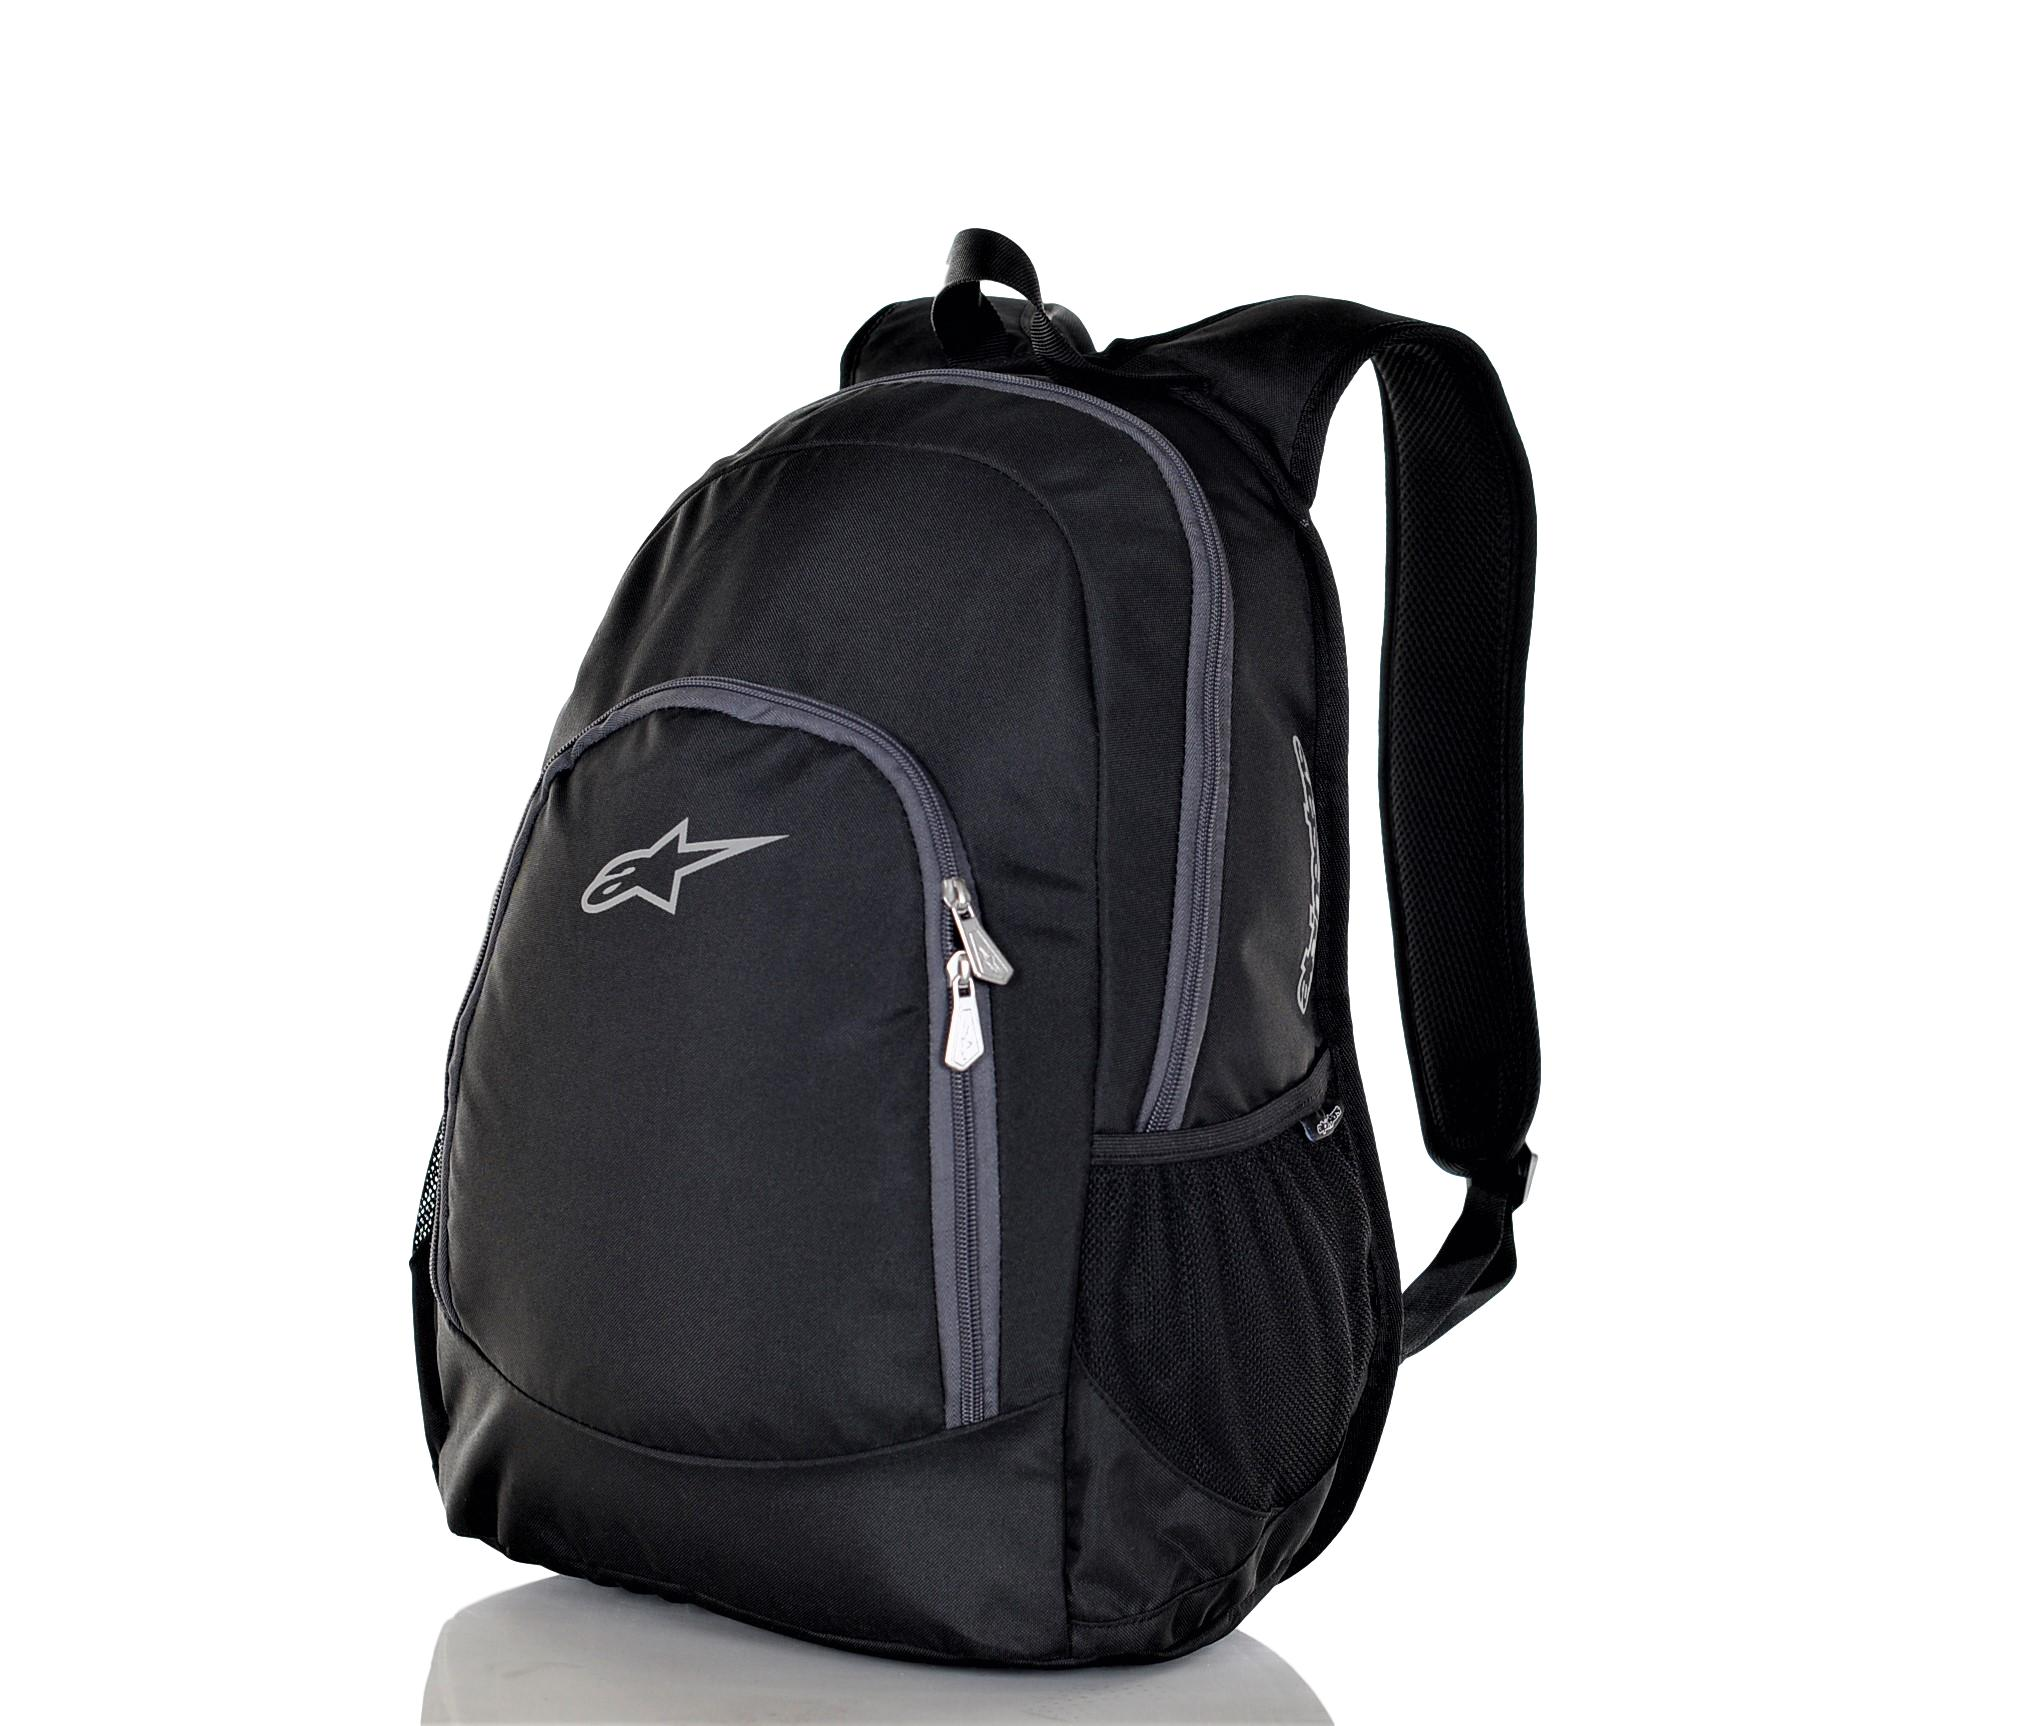 Alpinestars Defender Black//Red  Ruksack 22L Capacity Alpinestars Backpack